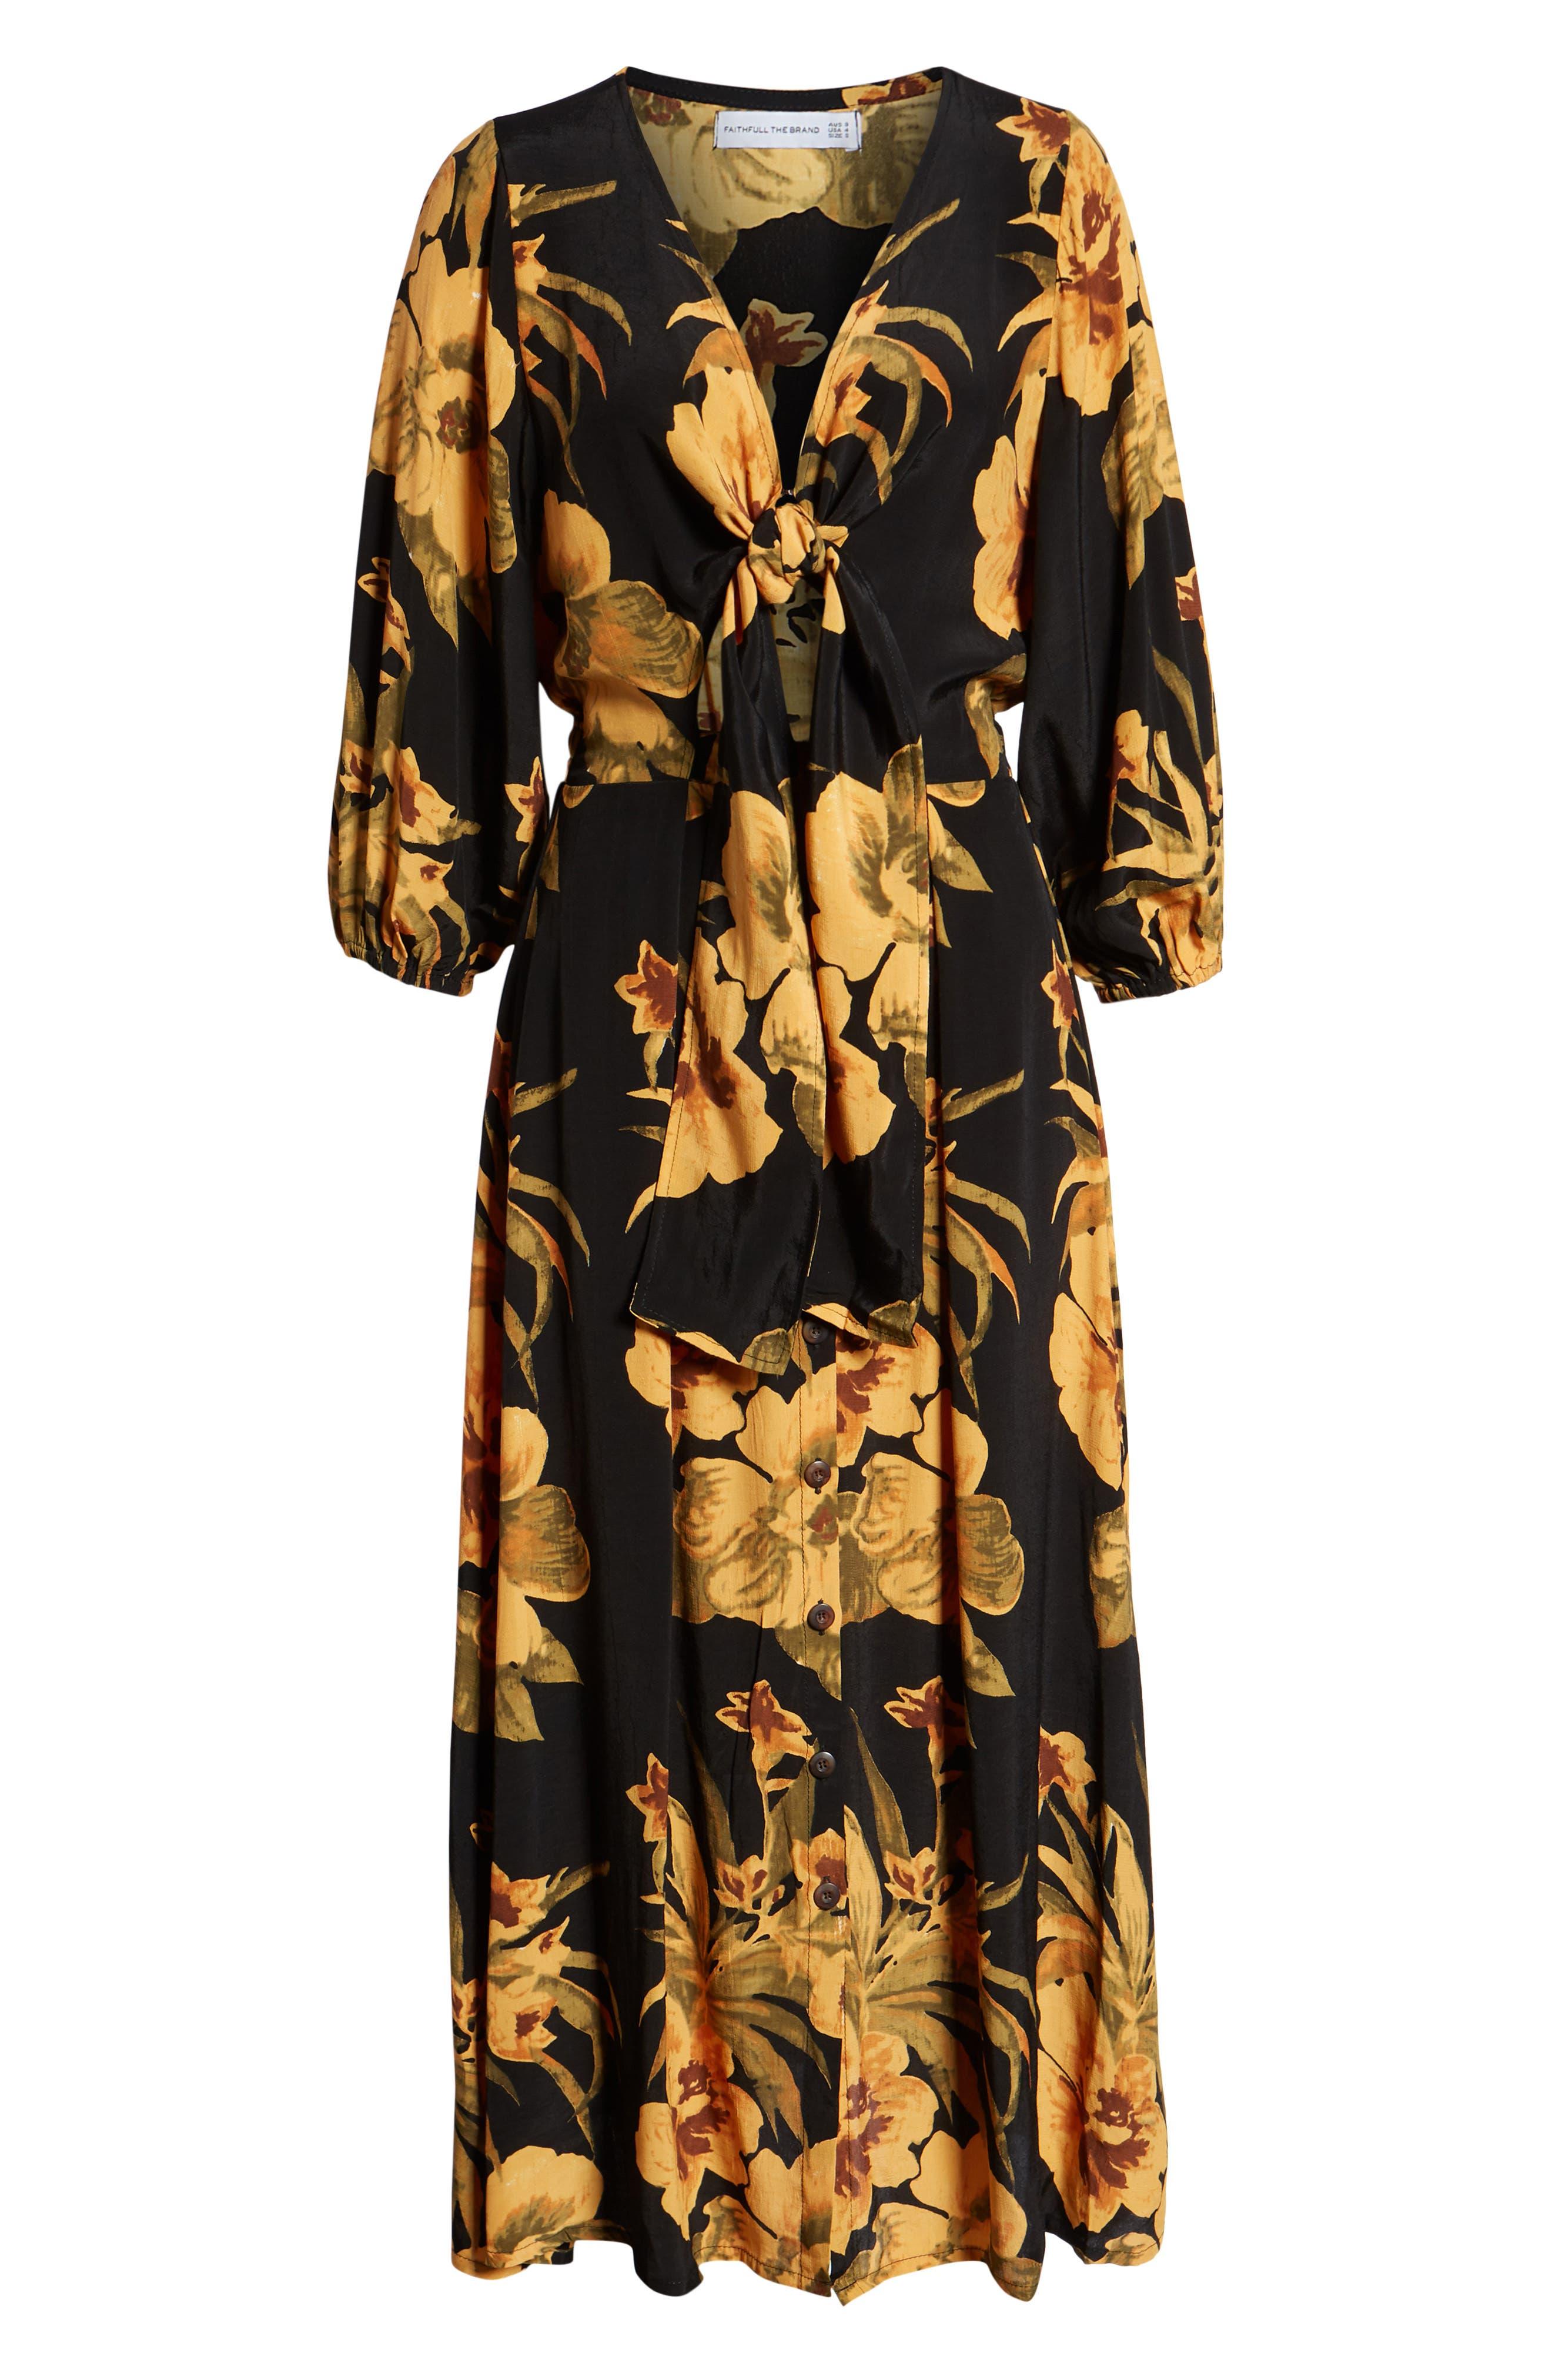 Oliviera Floral Print Cutout Midi Dress,                             Alternate thumbnail 4, color,                             CARIBBEAN PRINT